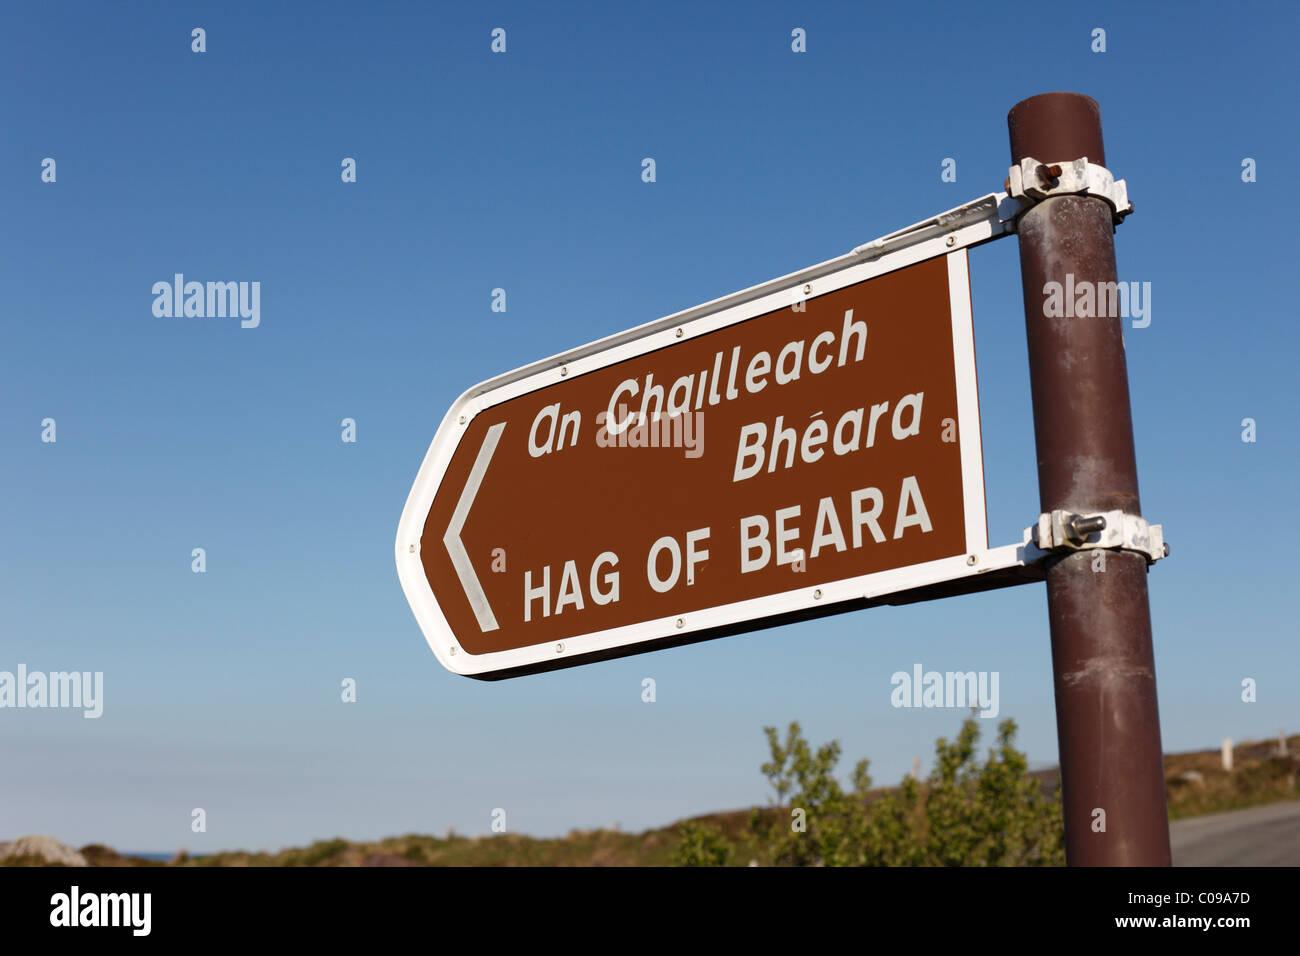 Signpost, Cailleach Bheara, Hag of Beara, Eyeries, Beara Peninsula, County Cork, Ireland, British Islands, Europ Stock Photo